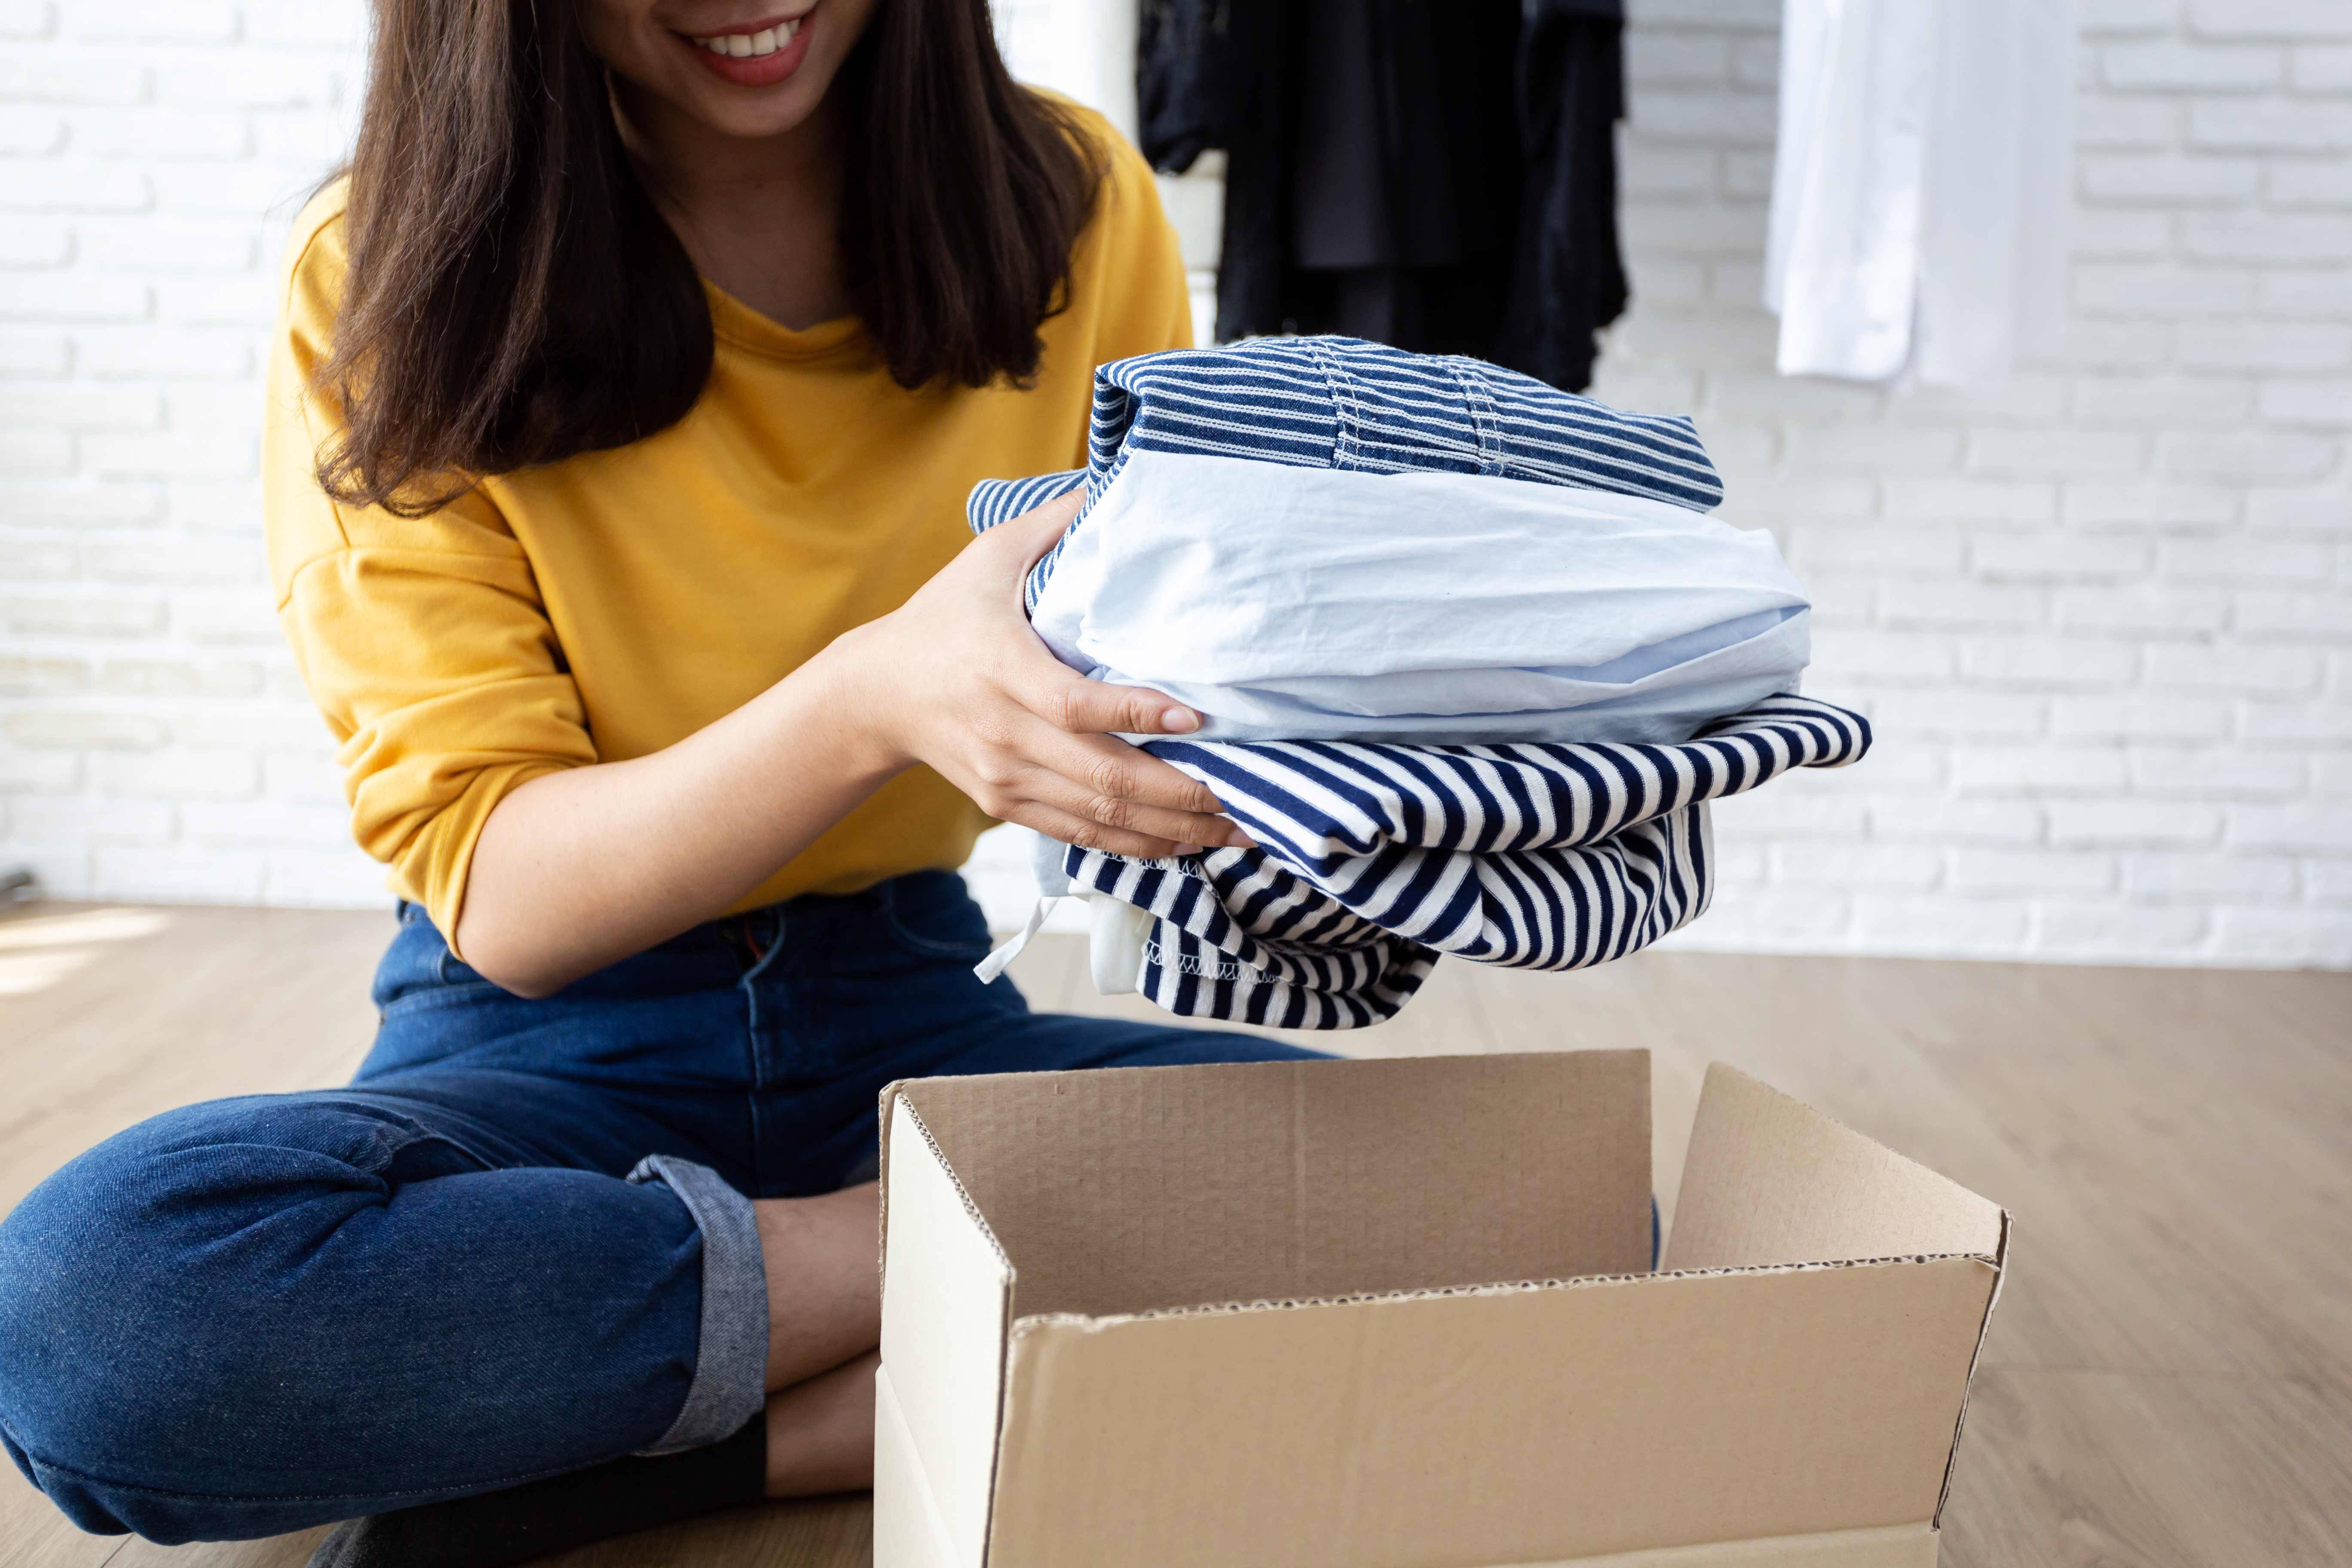 Kontoer Turnhout geefpunt kleding doneren